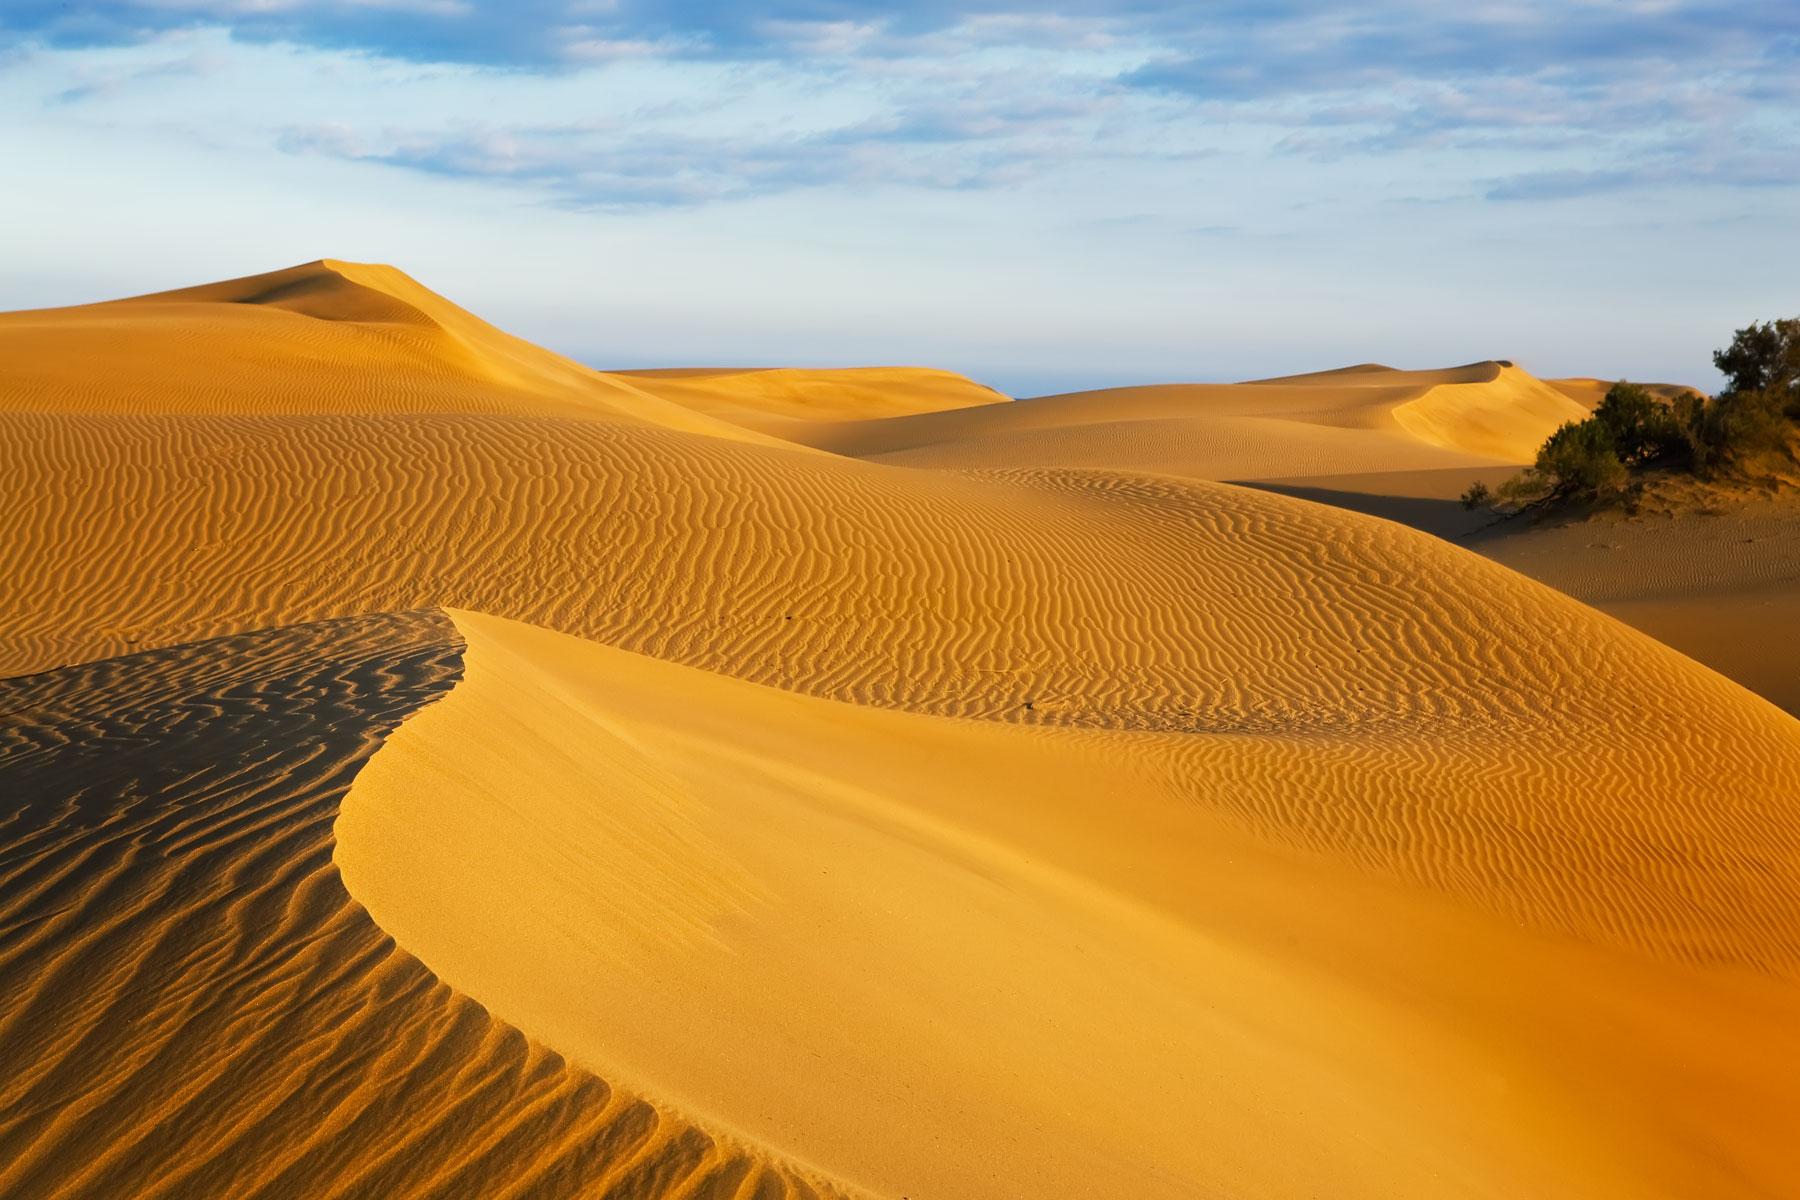 mesapaloma-sand-dunes-canary-silands-spain